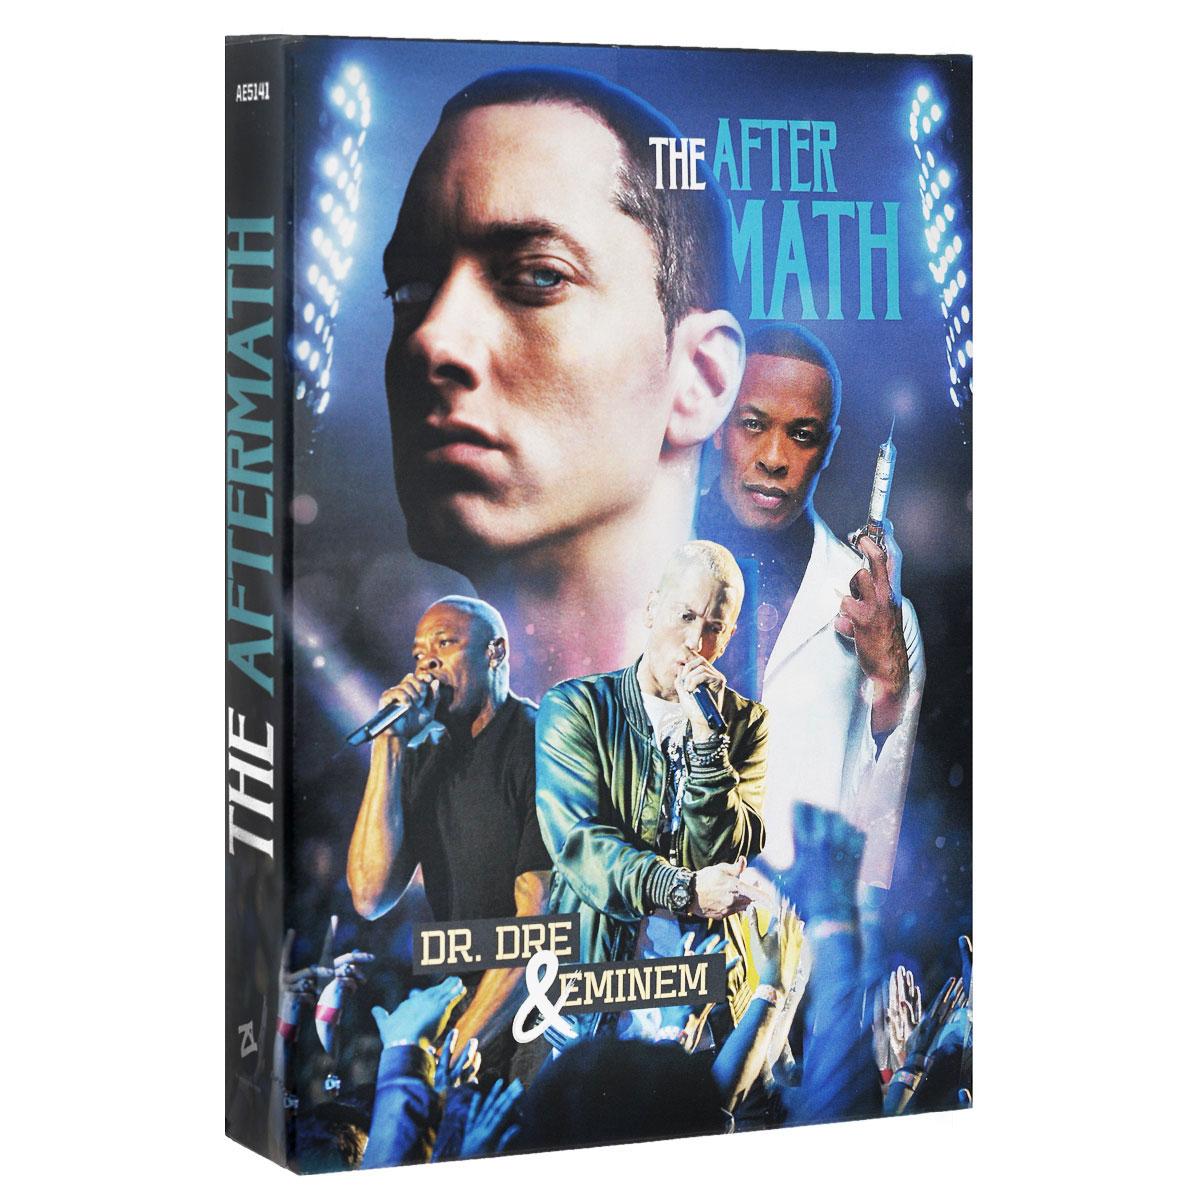 Dr. Dre & Eminem. The After Math (2 DVD) playboy after dark the legendary television show 3 dvd